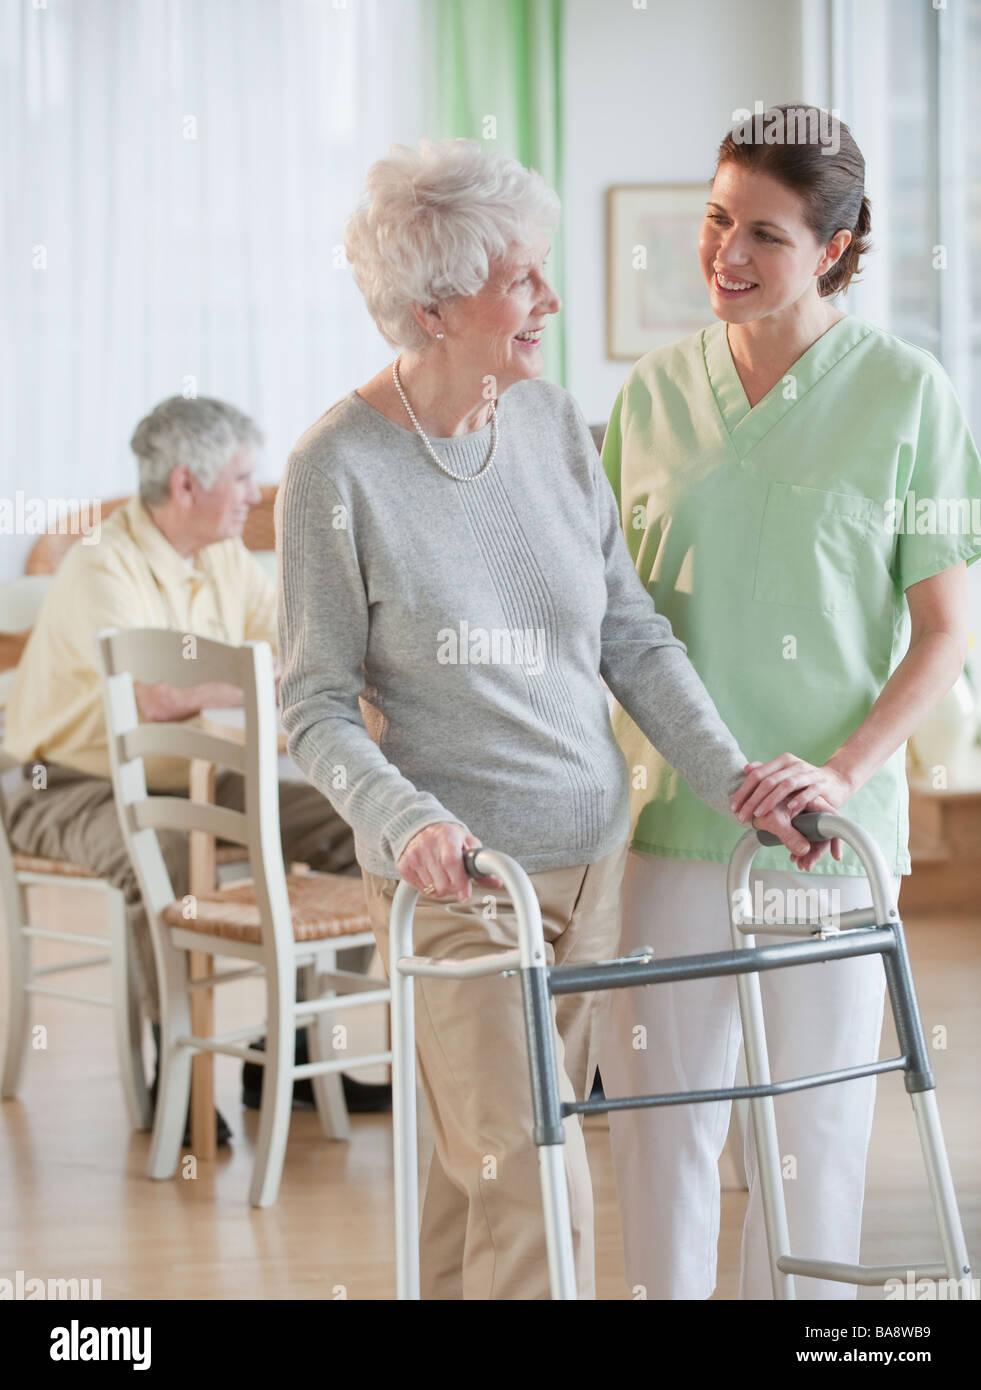 Nurse helping senior woman in walker Stock Photo